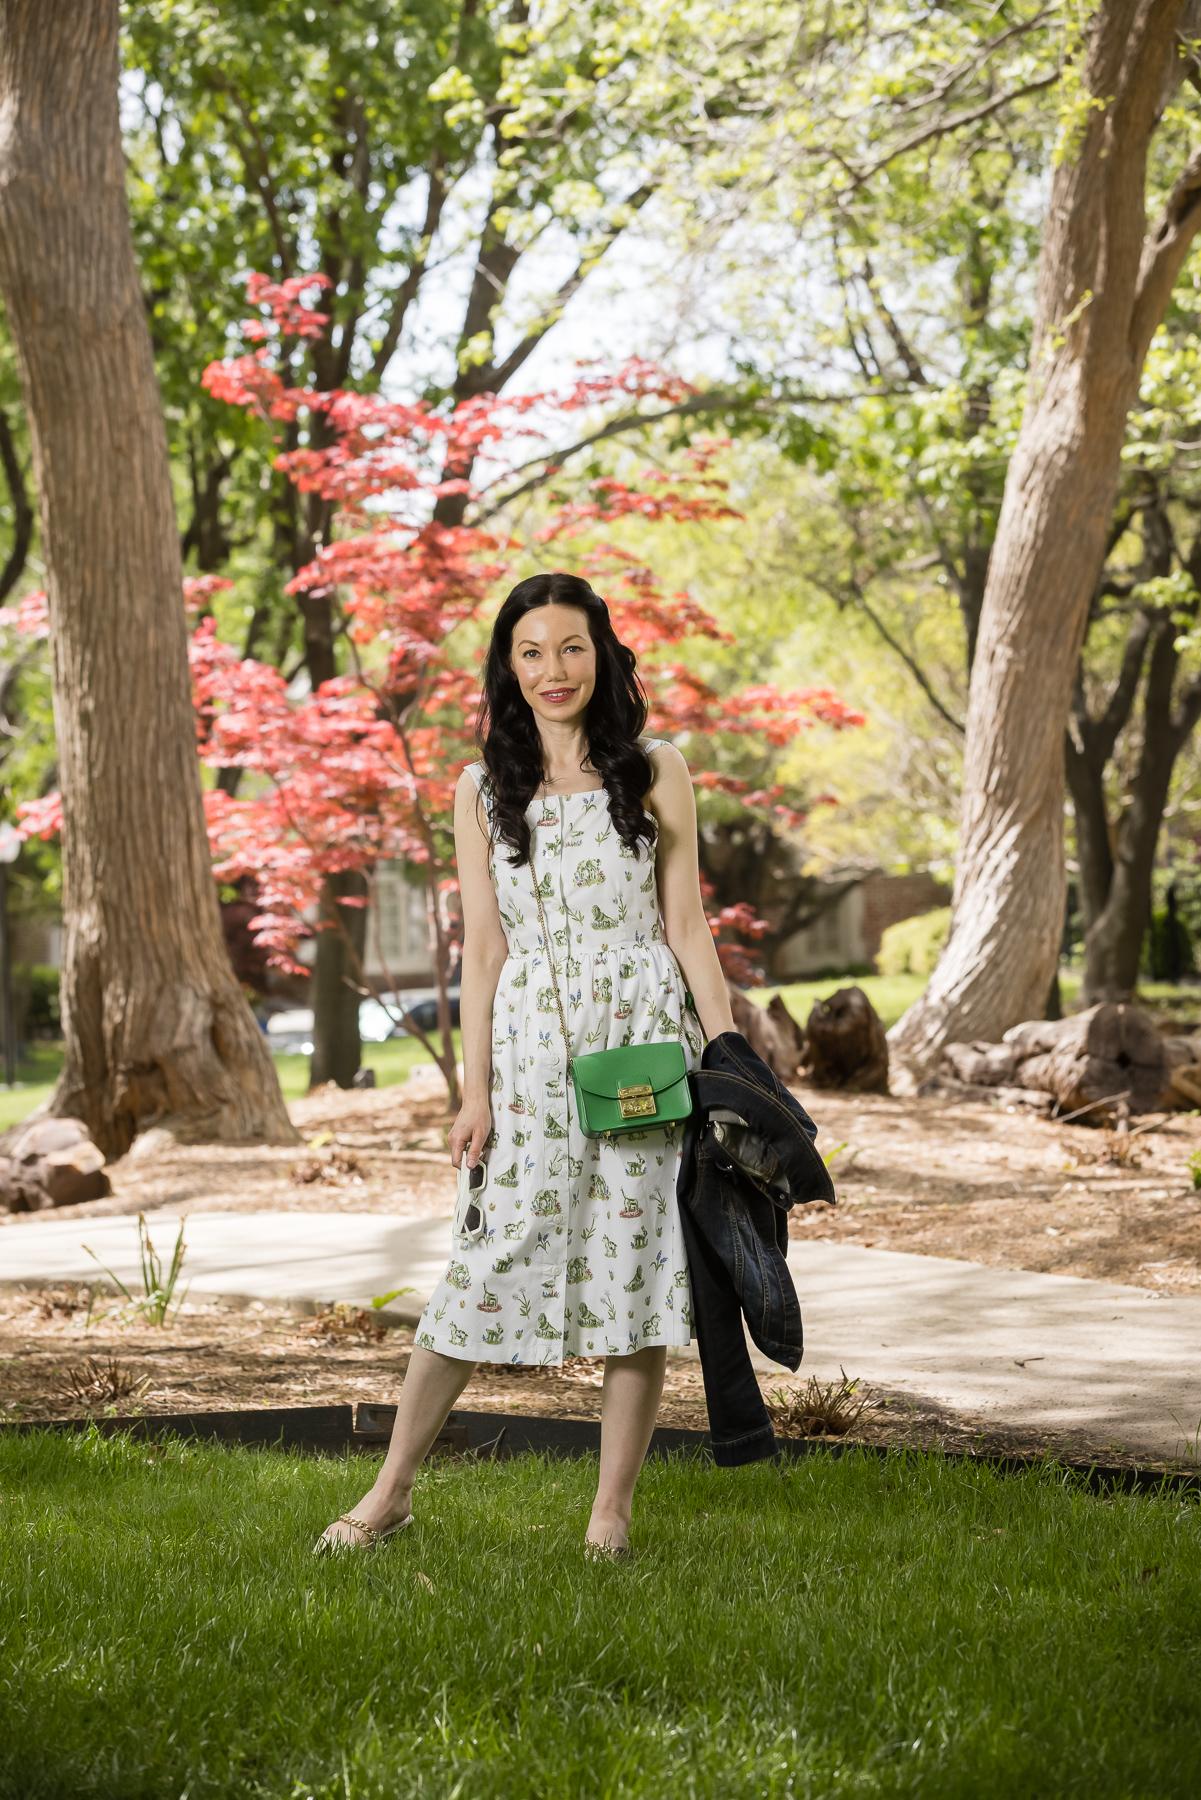 Sarah Patrick Collection Newport Topiary Gardens Dress styled with Green mini Furla crossbody bag